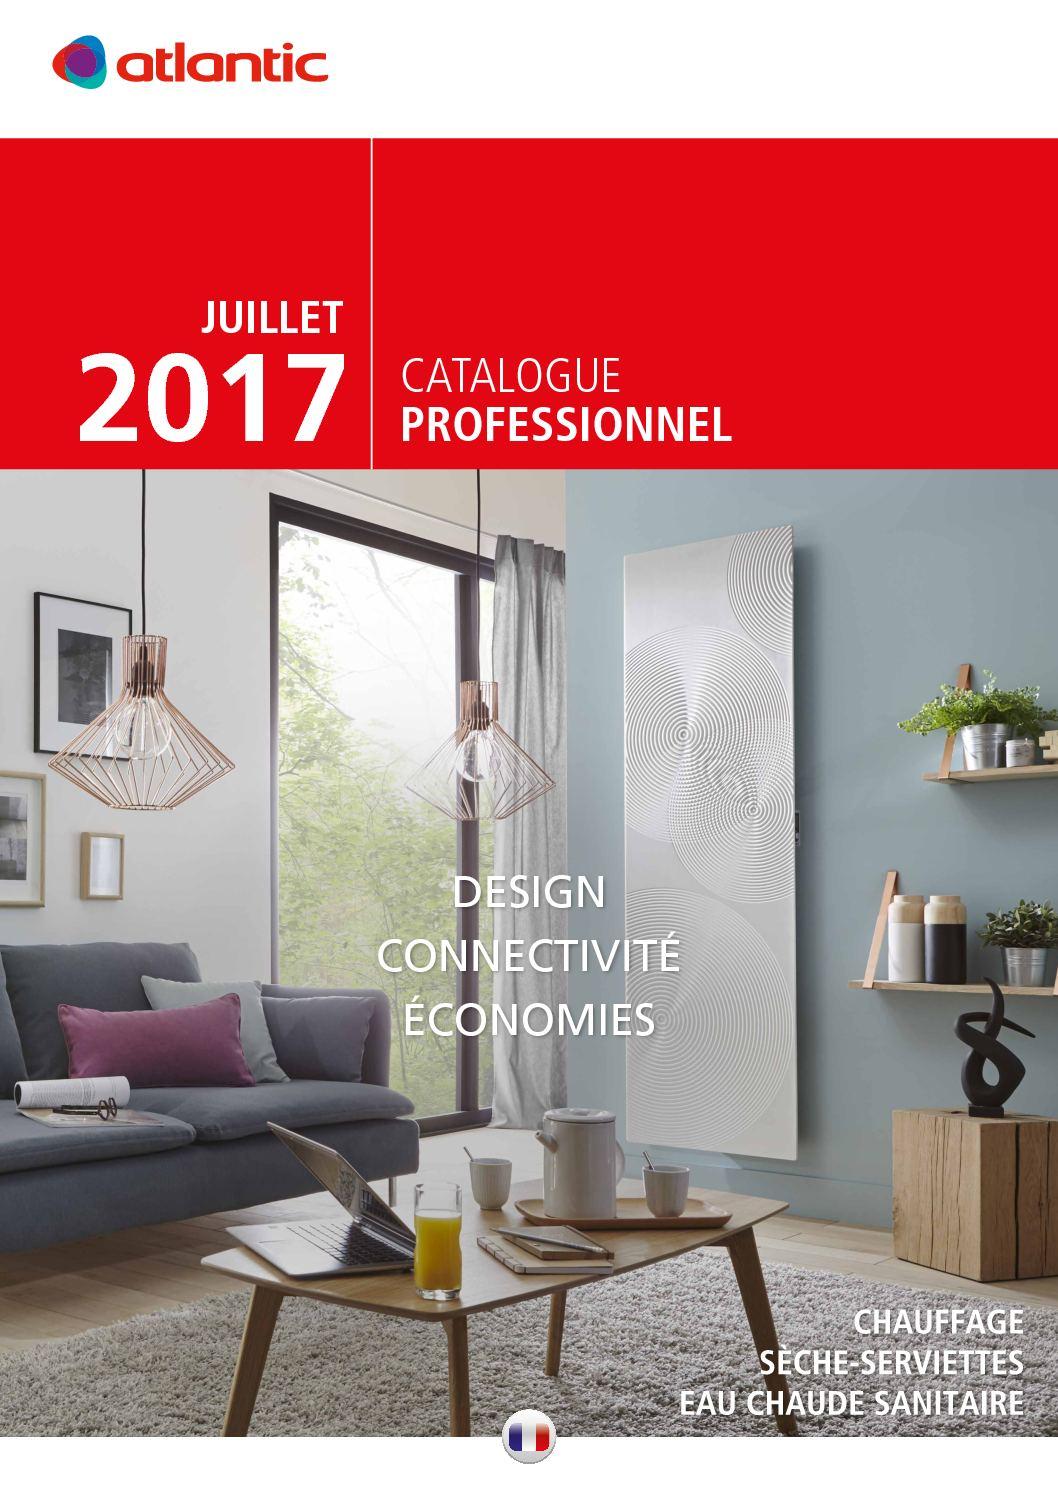 Atlantic Catalogue 2017